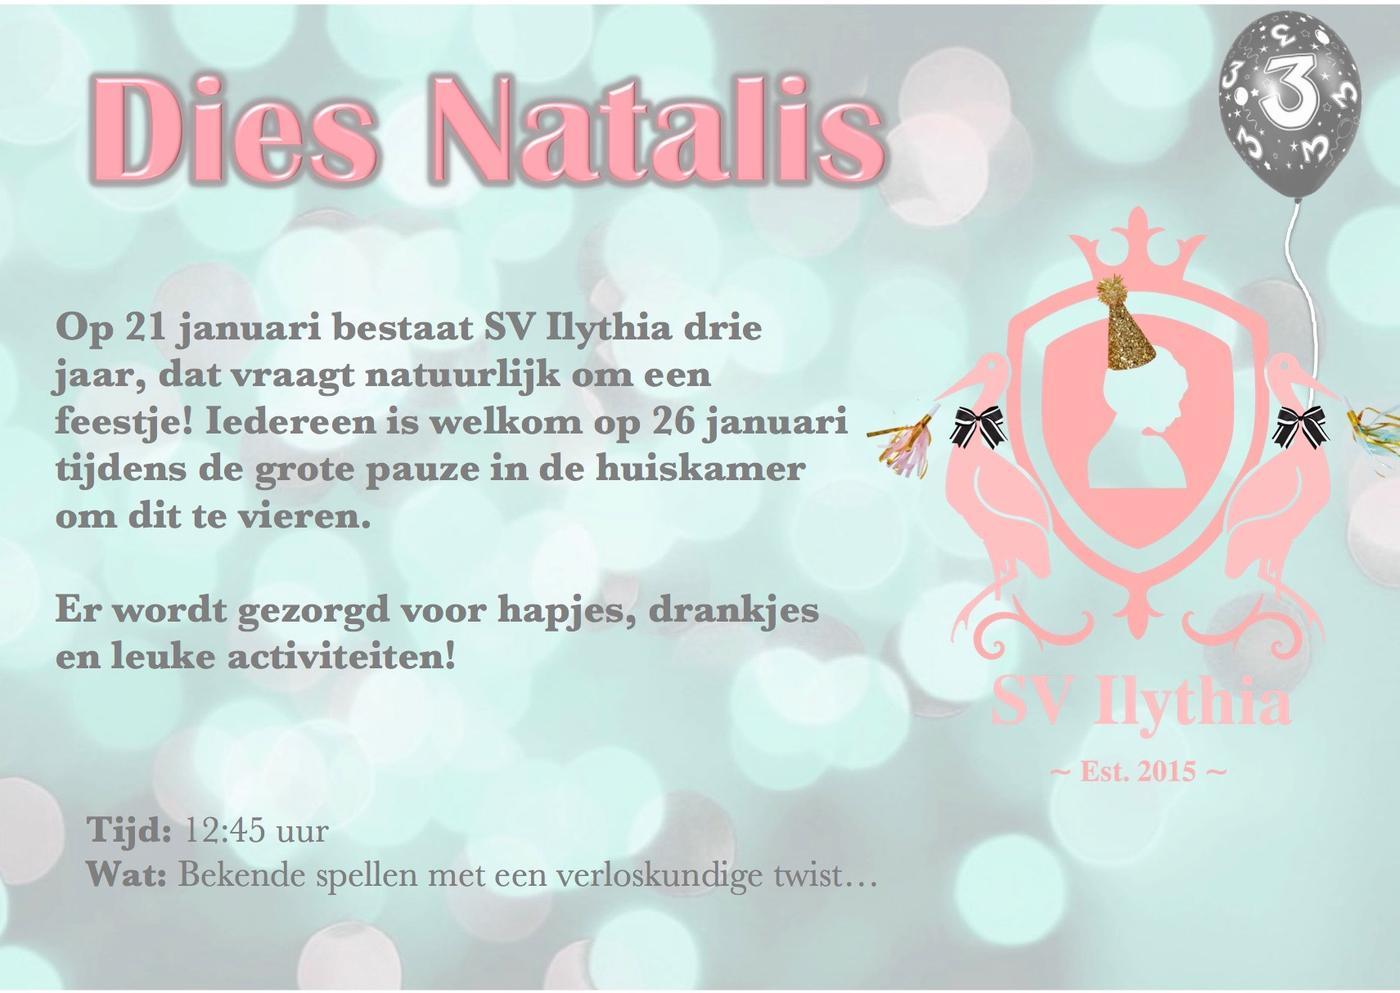 Diës Natalis